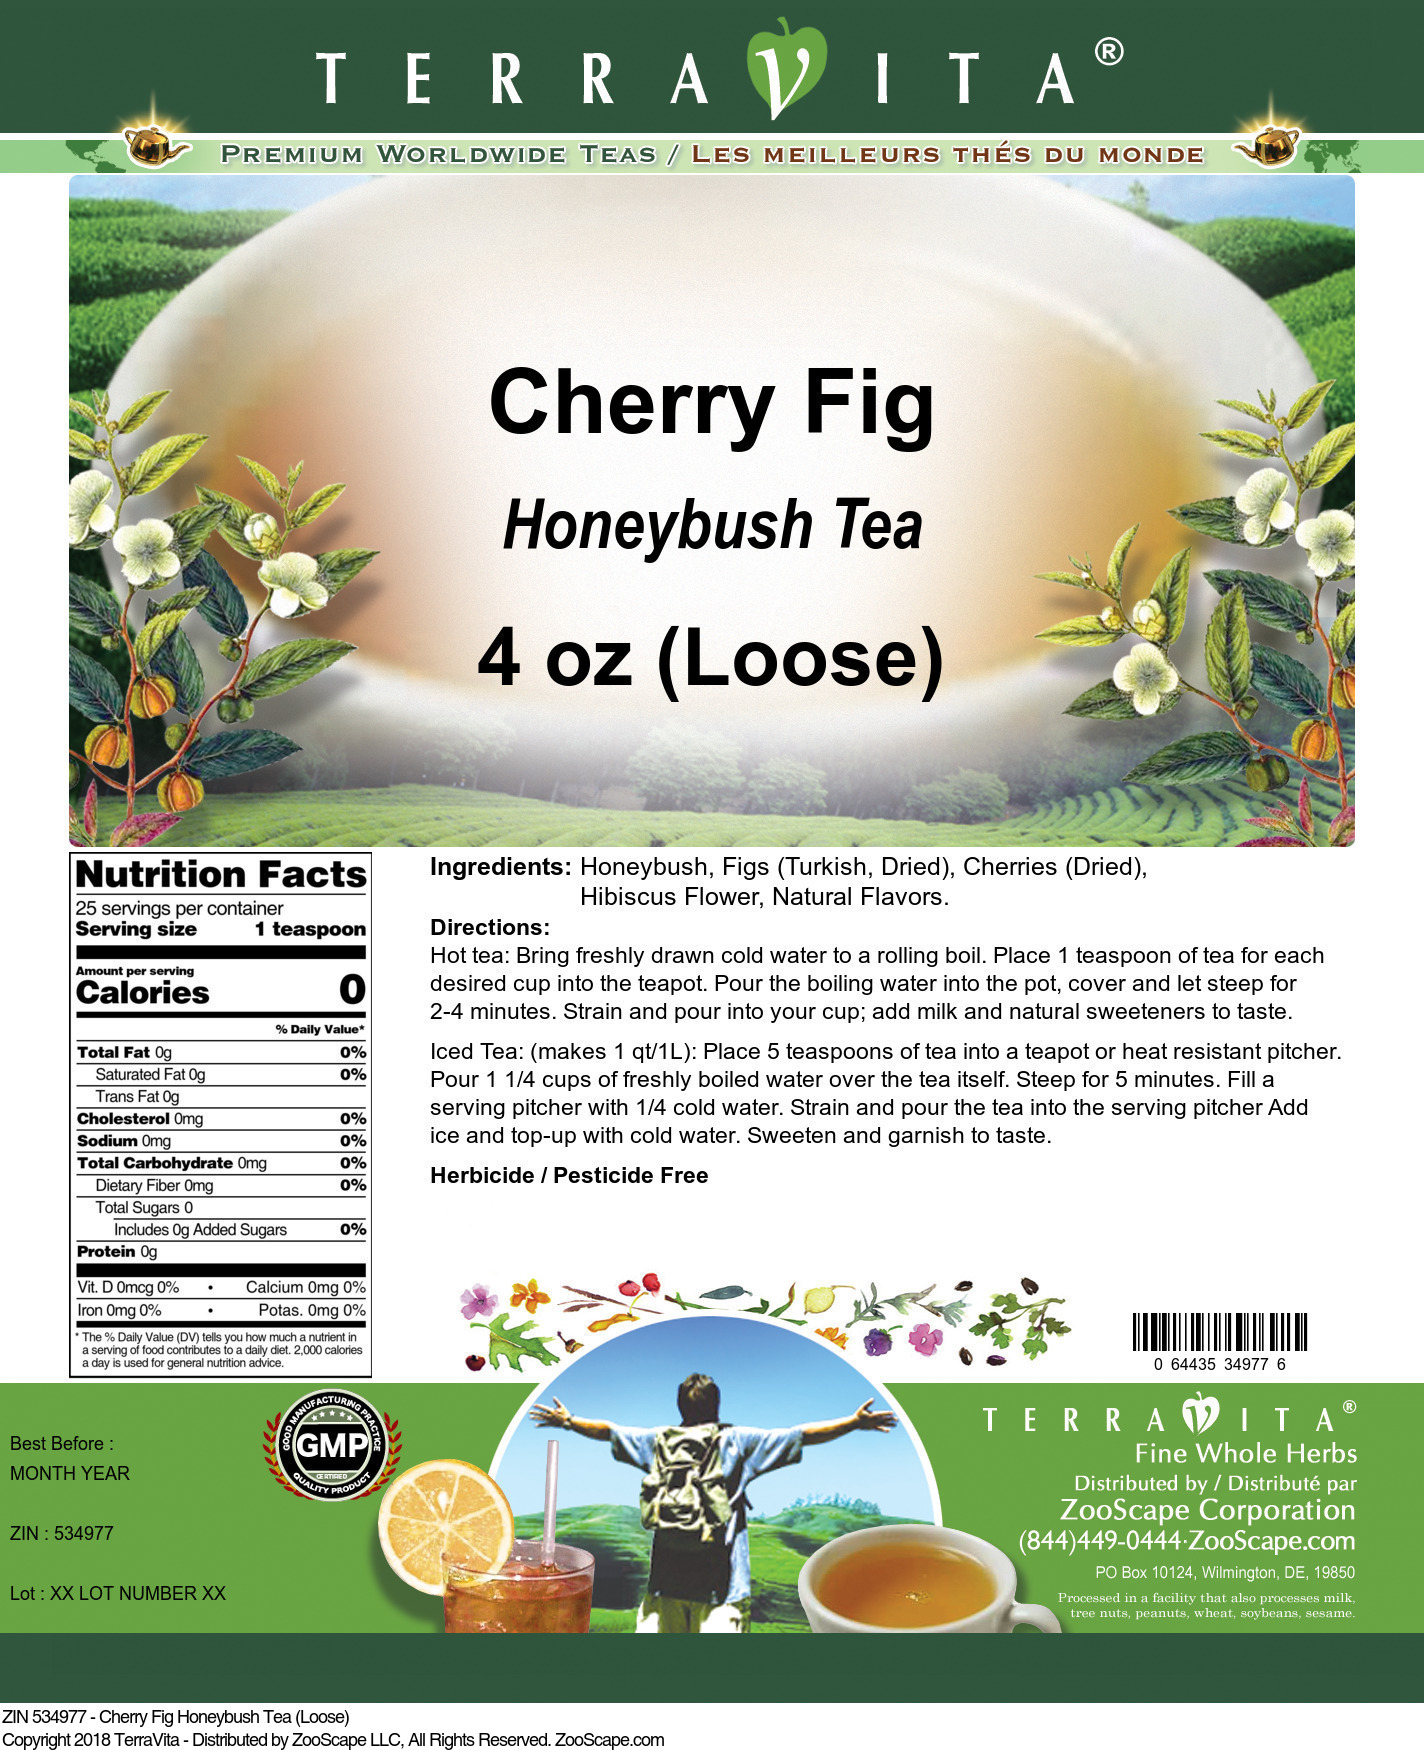 Cherry Fig Honeybush Tea